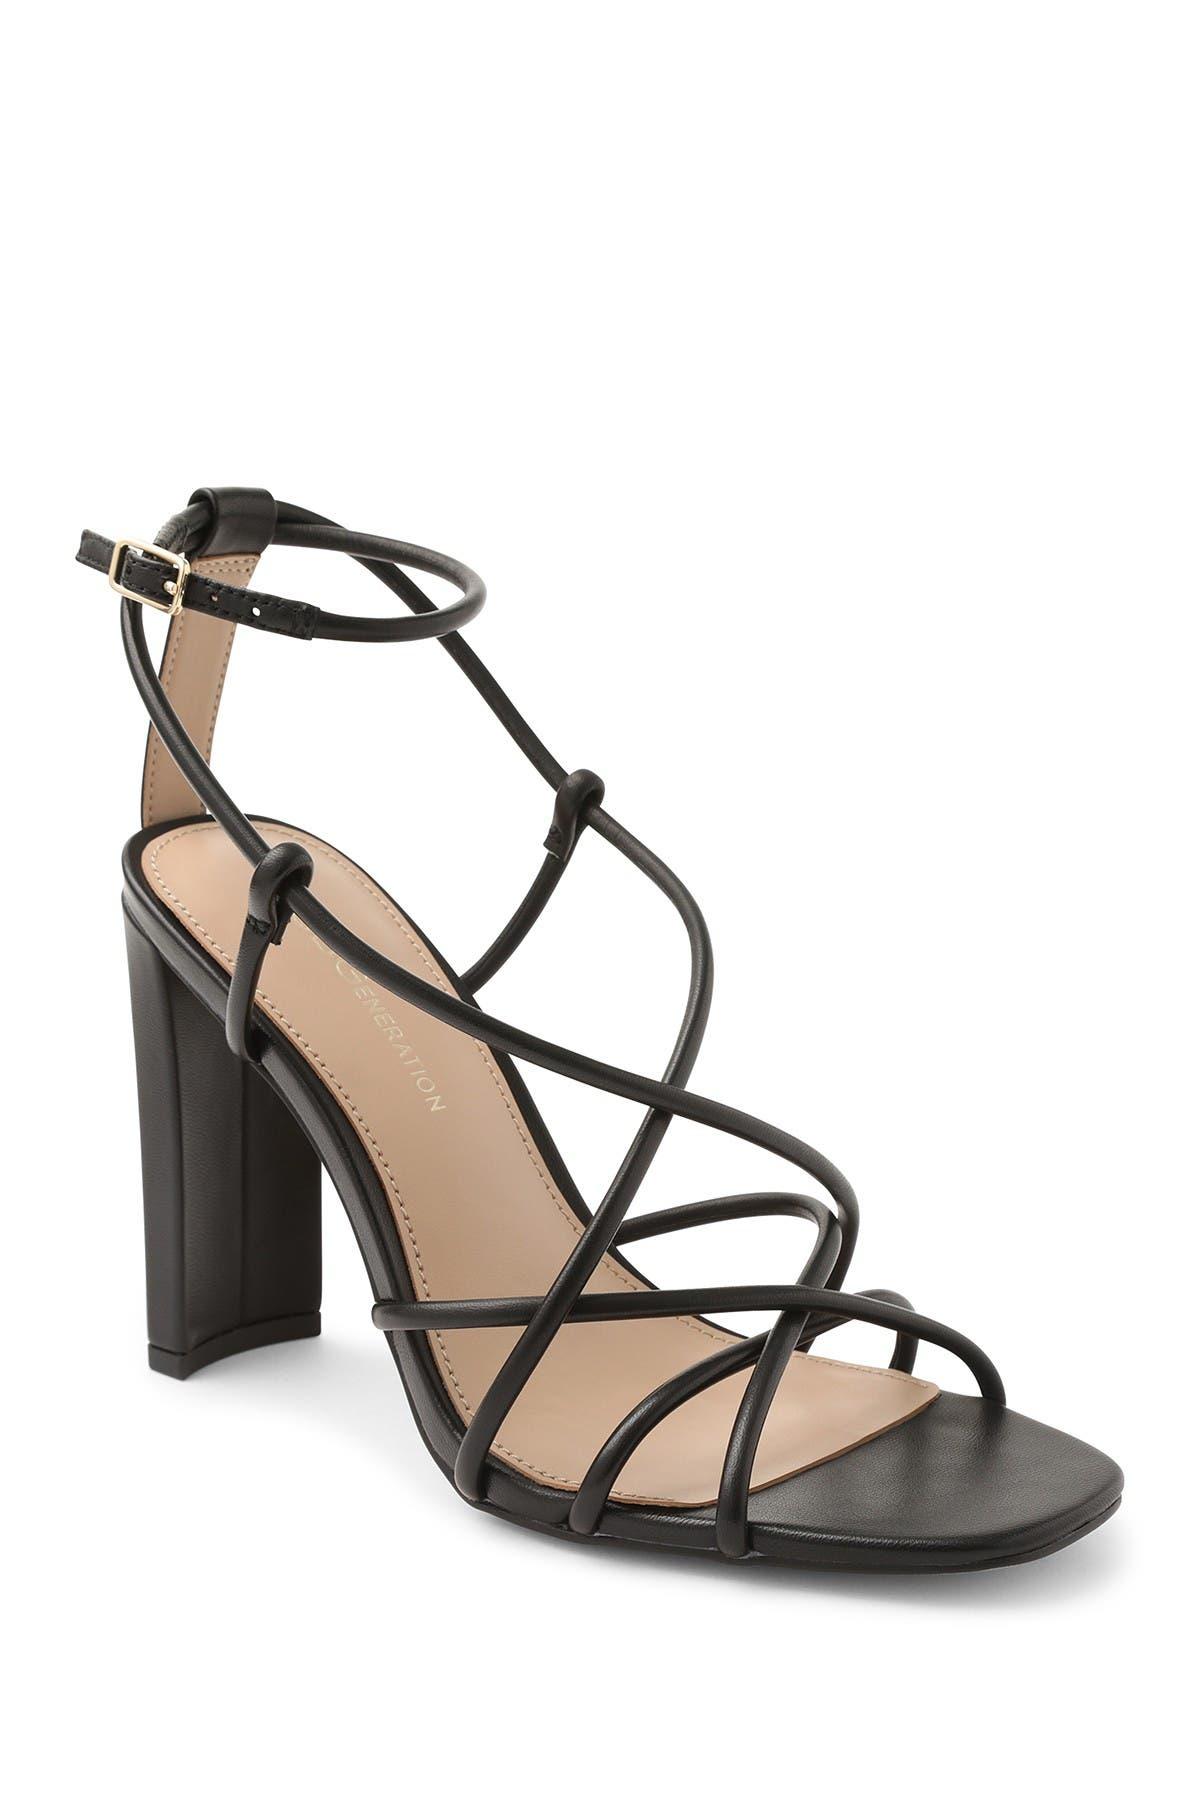 Image of BCBGeneration Wanni Ankle Strap Sandal